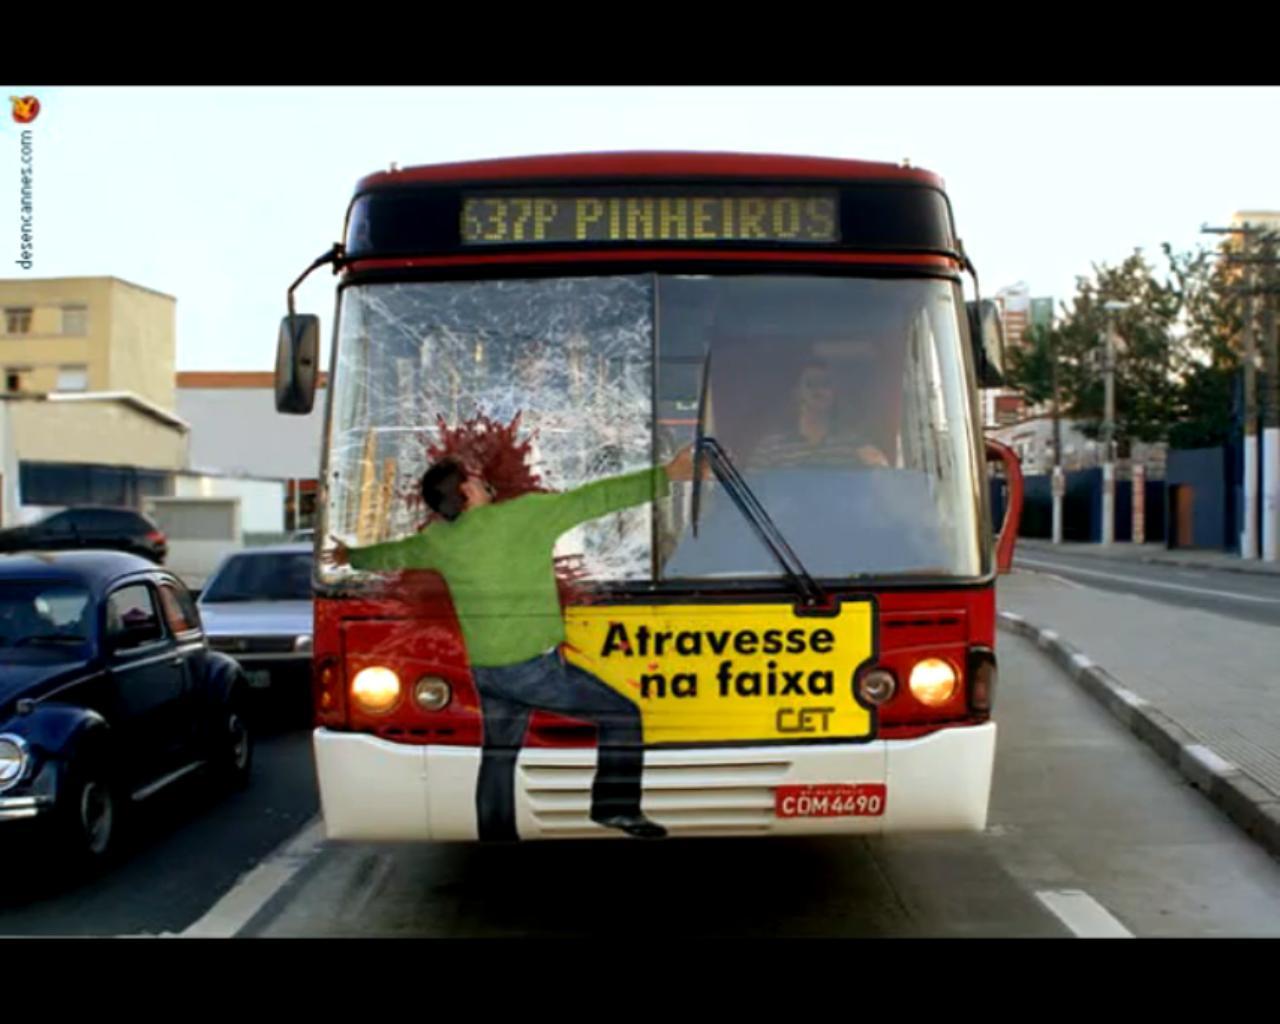 Прижимки в автобусе фото 1 фотография